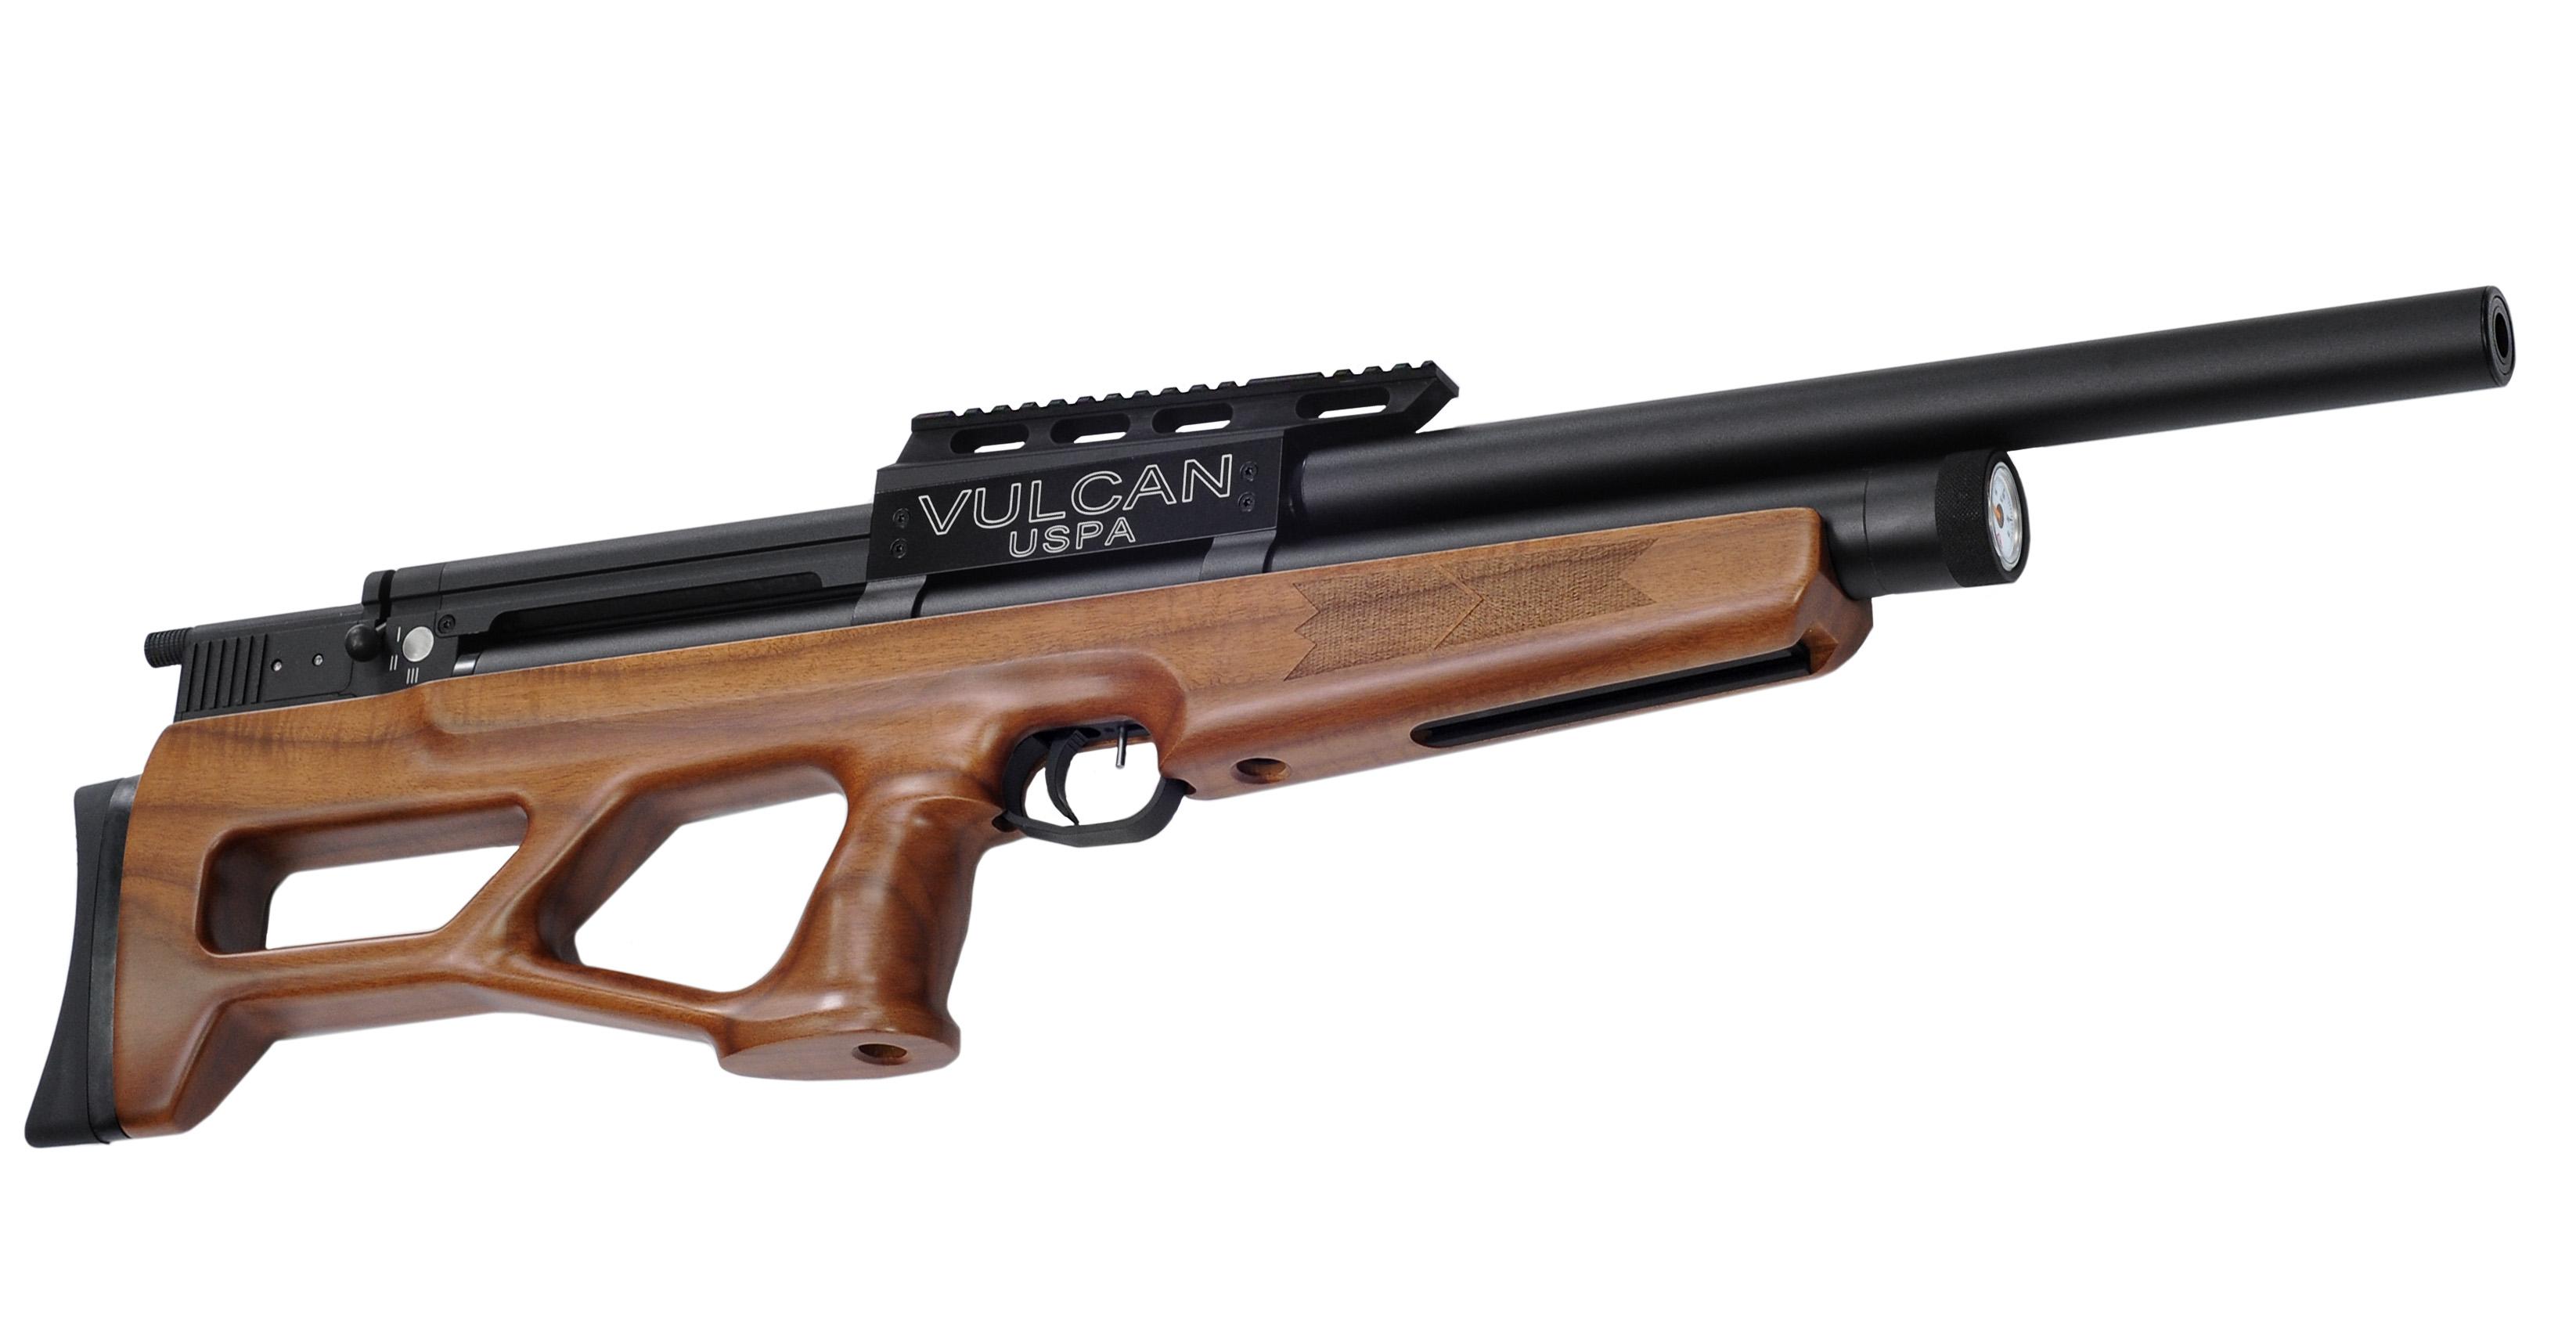 Vulcan USPA Tranquilizer Dart Gun | Airgun Nut